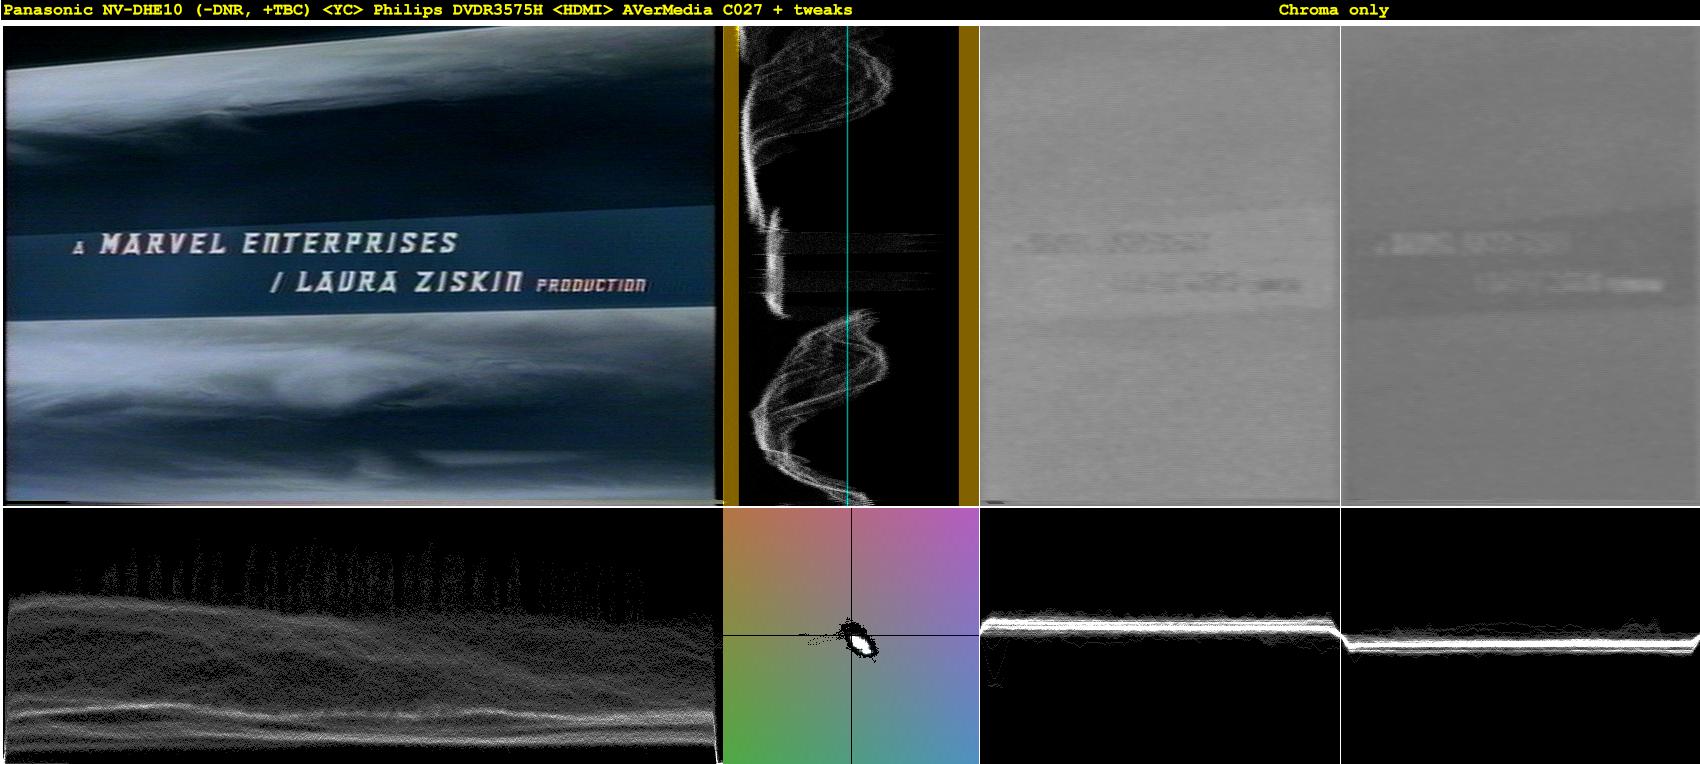 Click image for larger version  Name:0-09-01 - Panasonic NV-DHE10 (-DNR, +TBC).png Views:906 Size:947.2 KB ID:37992